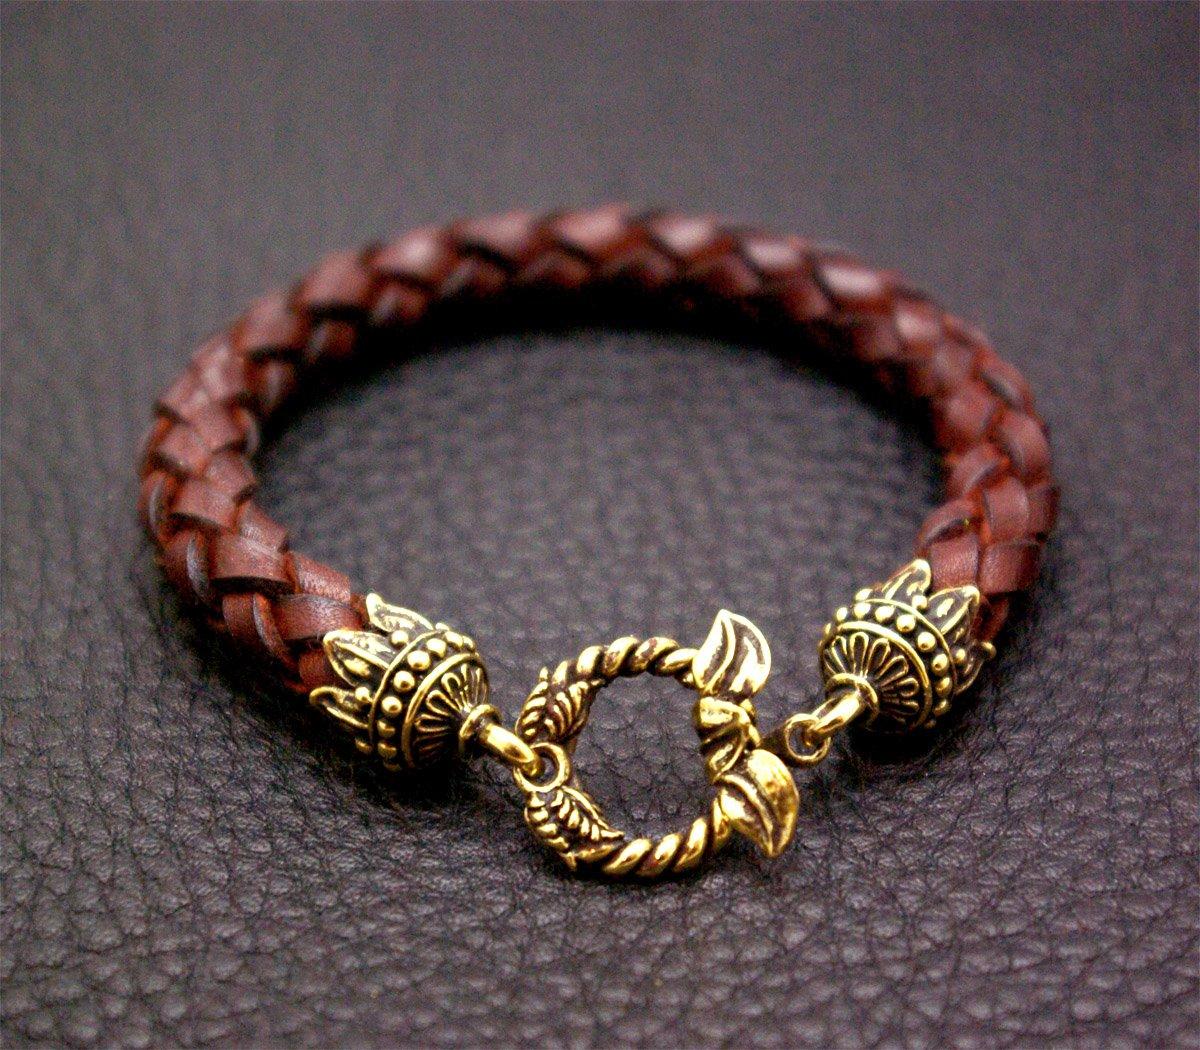 Image of Leather Bracelet with Leaf Lock - FORSALE